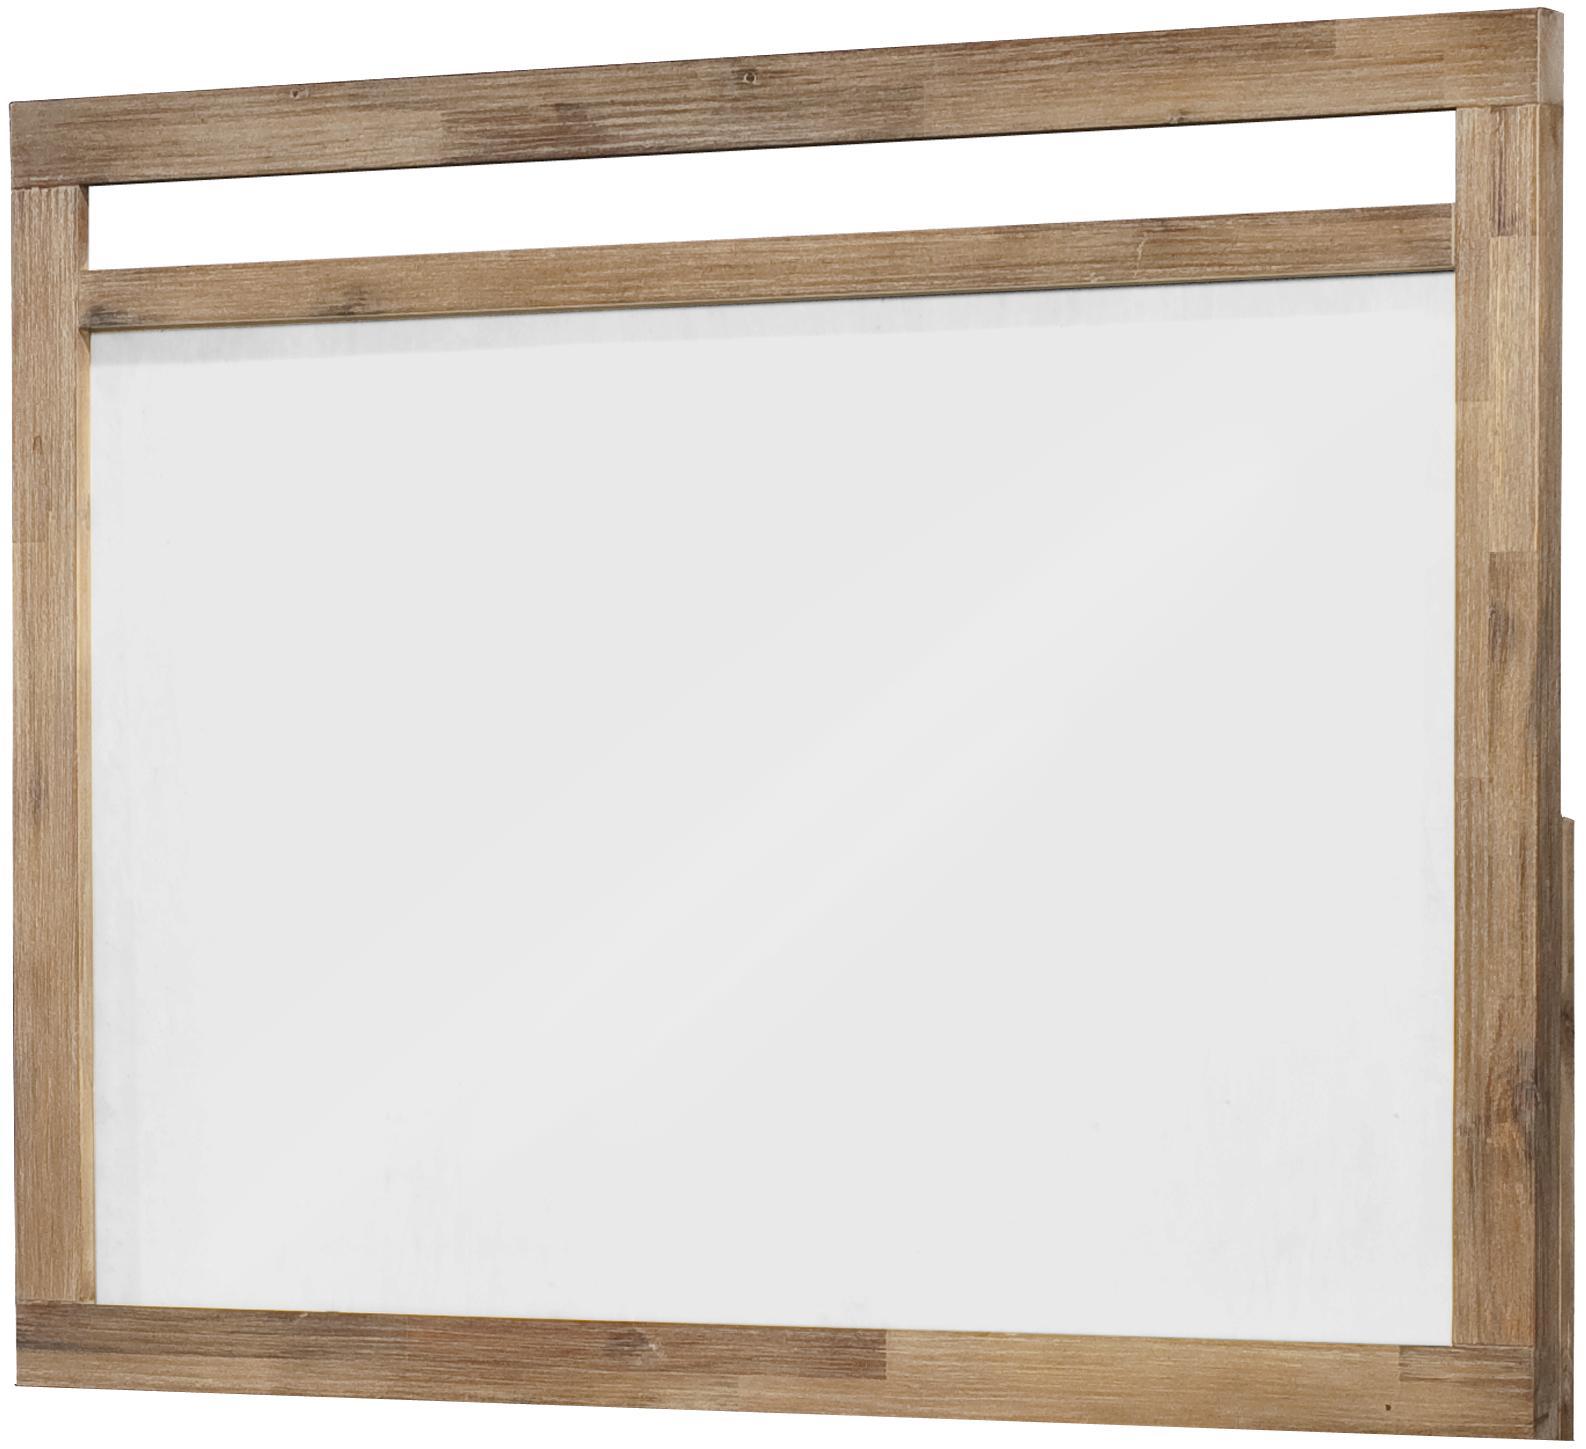 Cresent Fine Furniture Waverly Mirror - Item Number: 5502